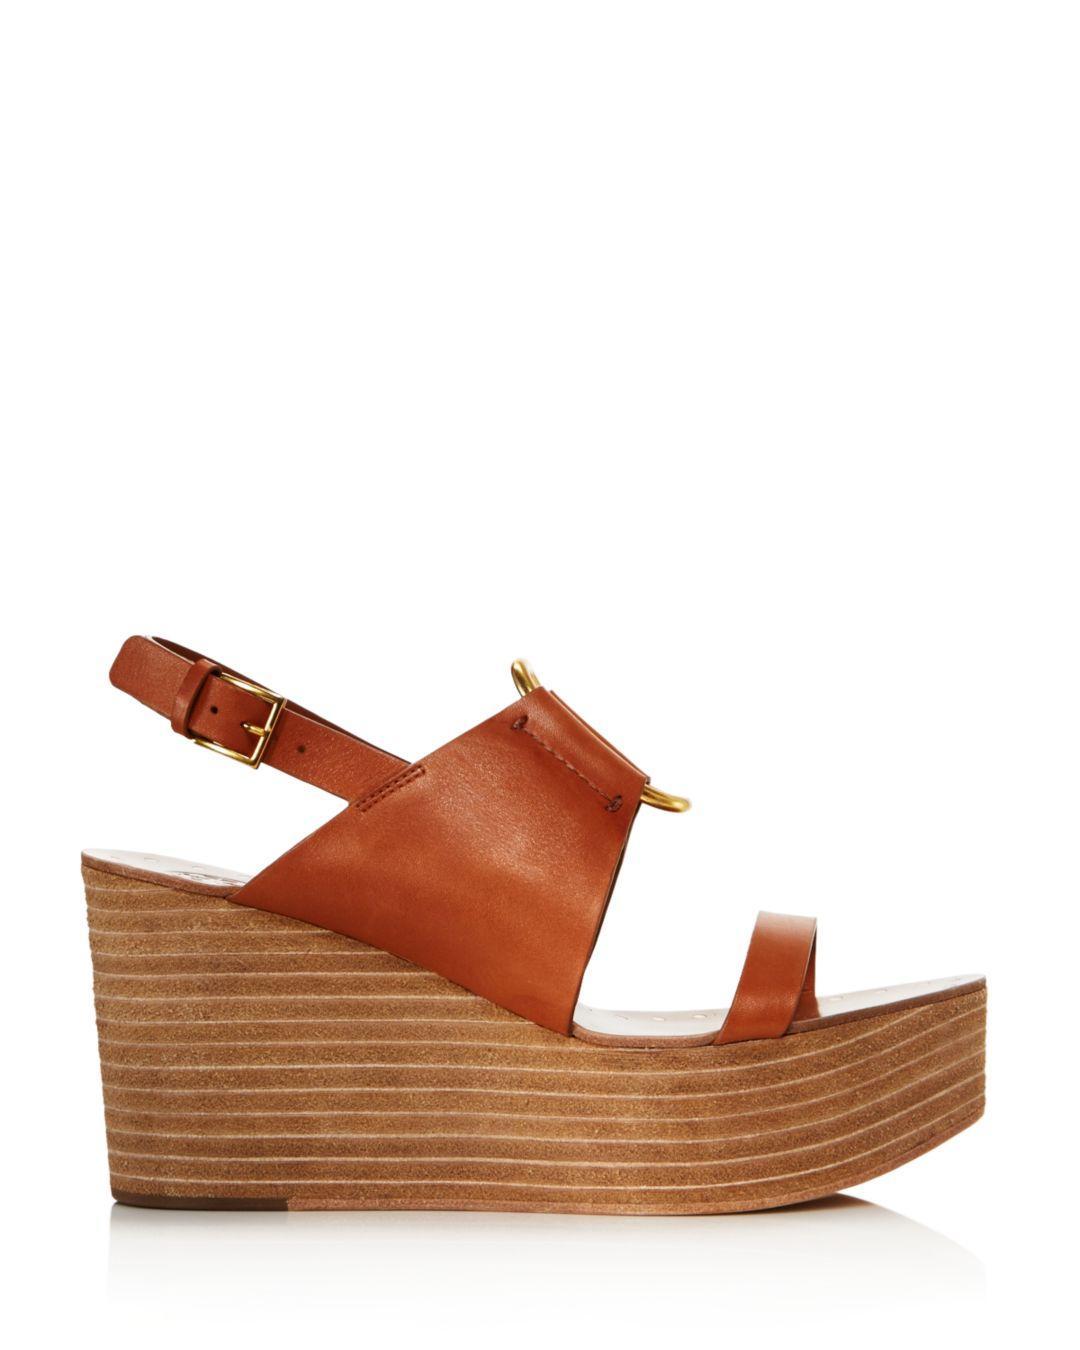 cbb9f59f4 Tory Burch Women's Ravello Platform Sandals in Brown - Lyst